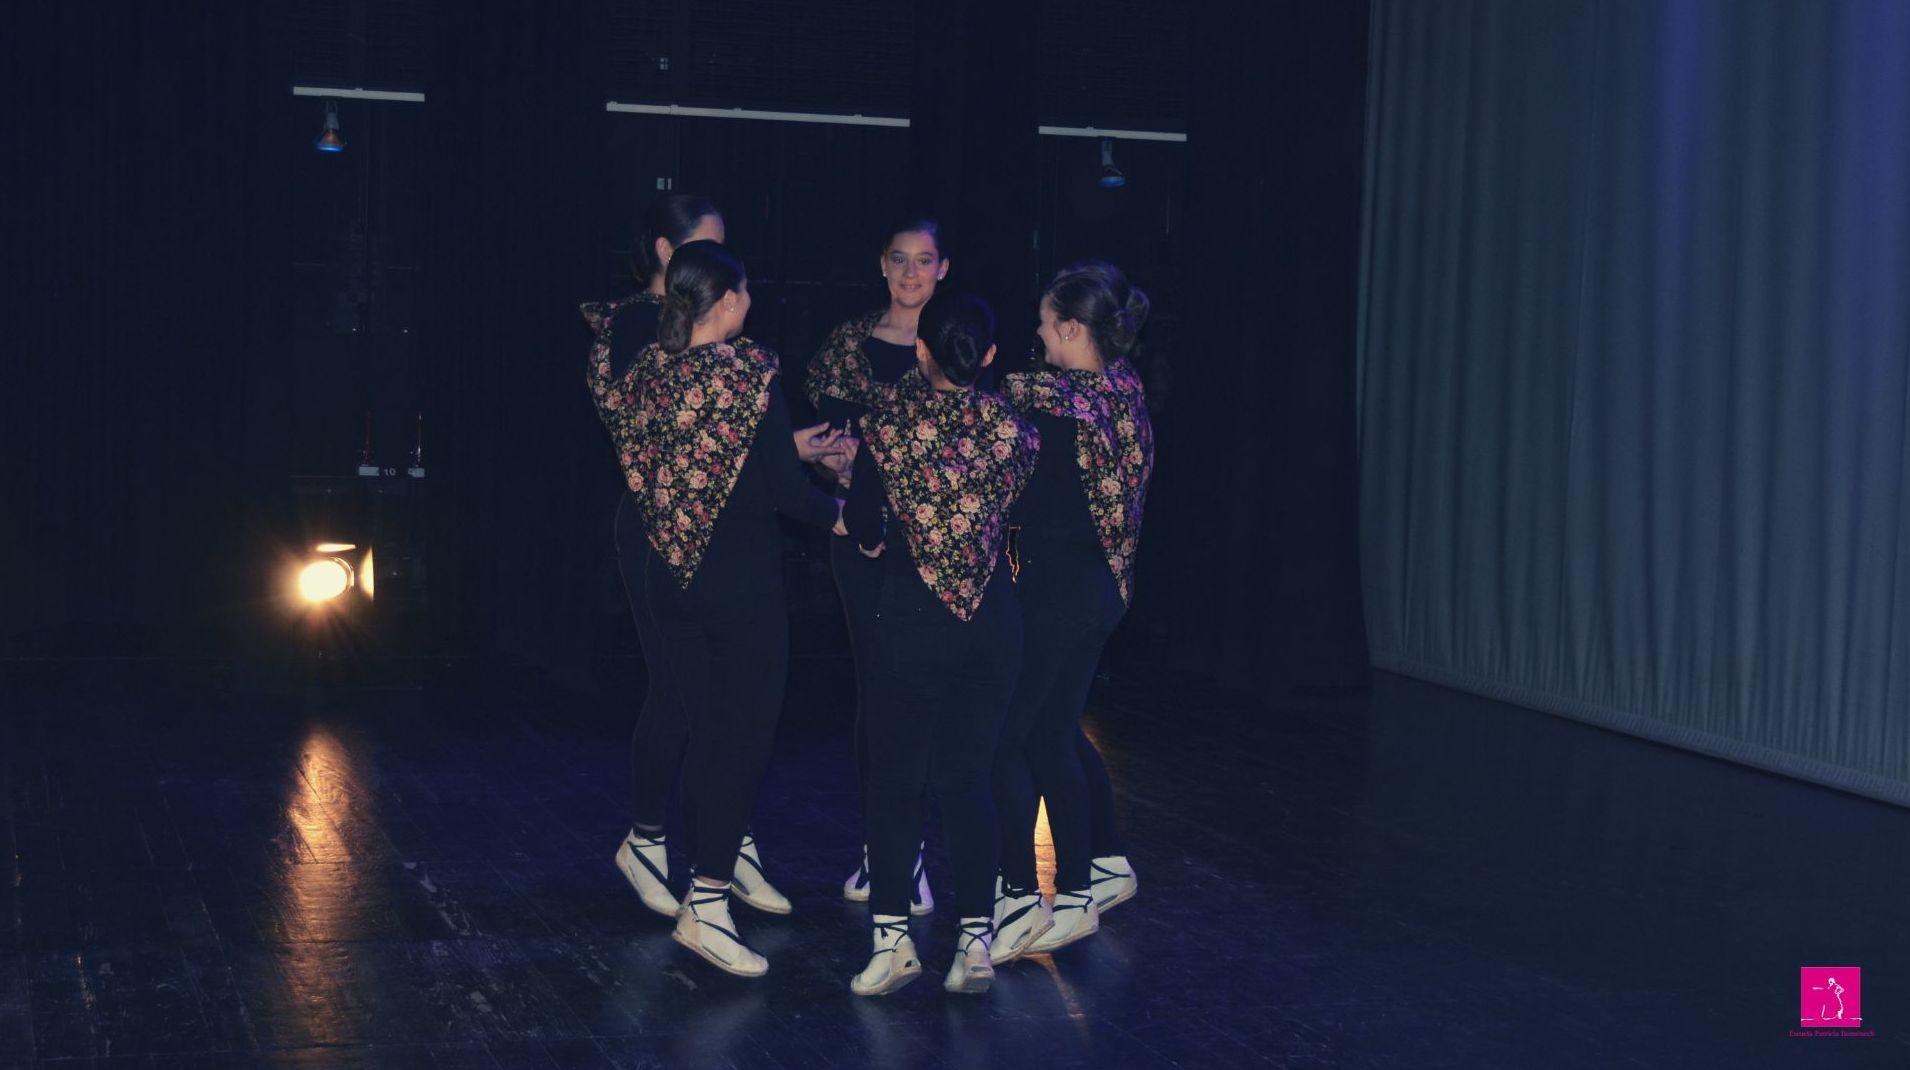 Folclore escuela de danza patricia Domenech